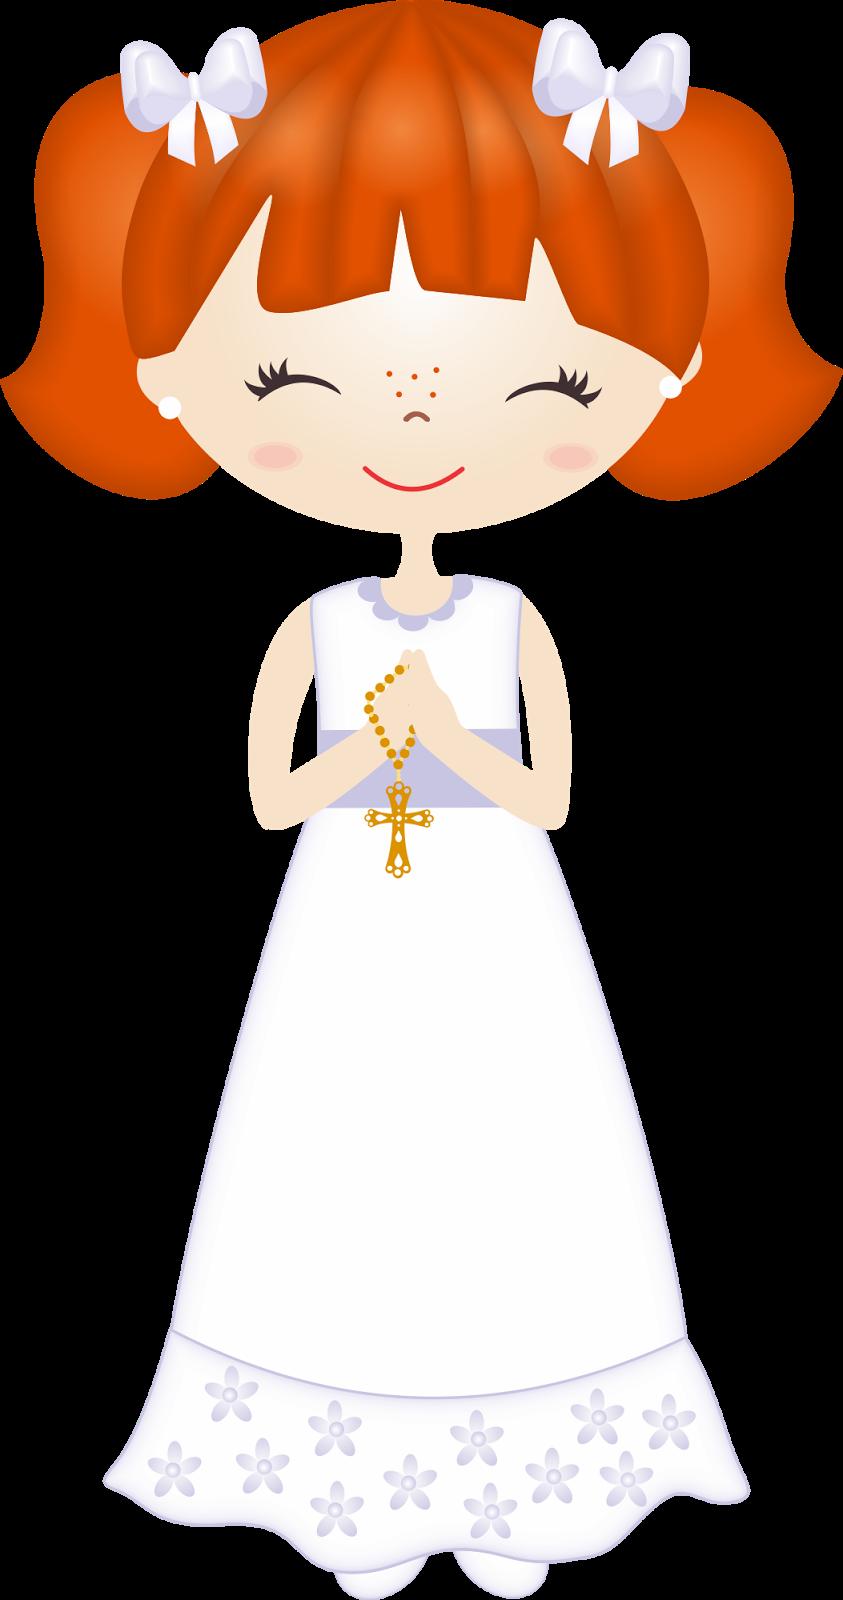 Clipart de Nenas en su Primera Comunión. | I KOMUNIA ŚW ... for Communion Girl Clipart  588gtk